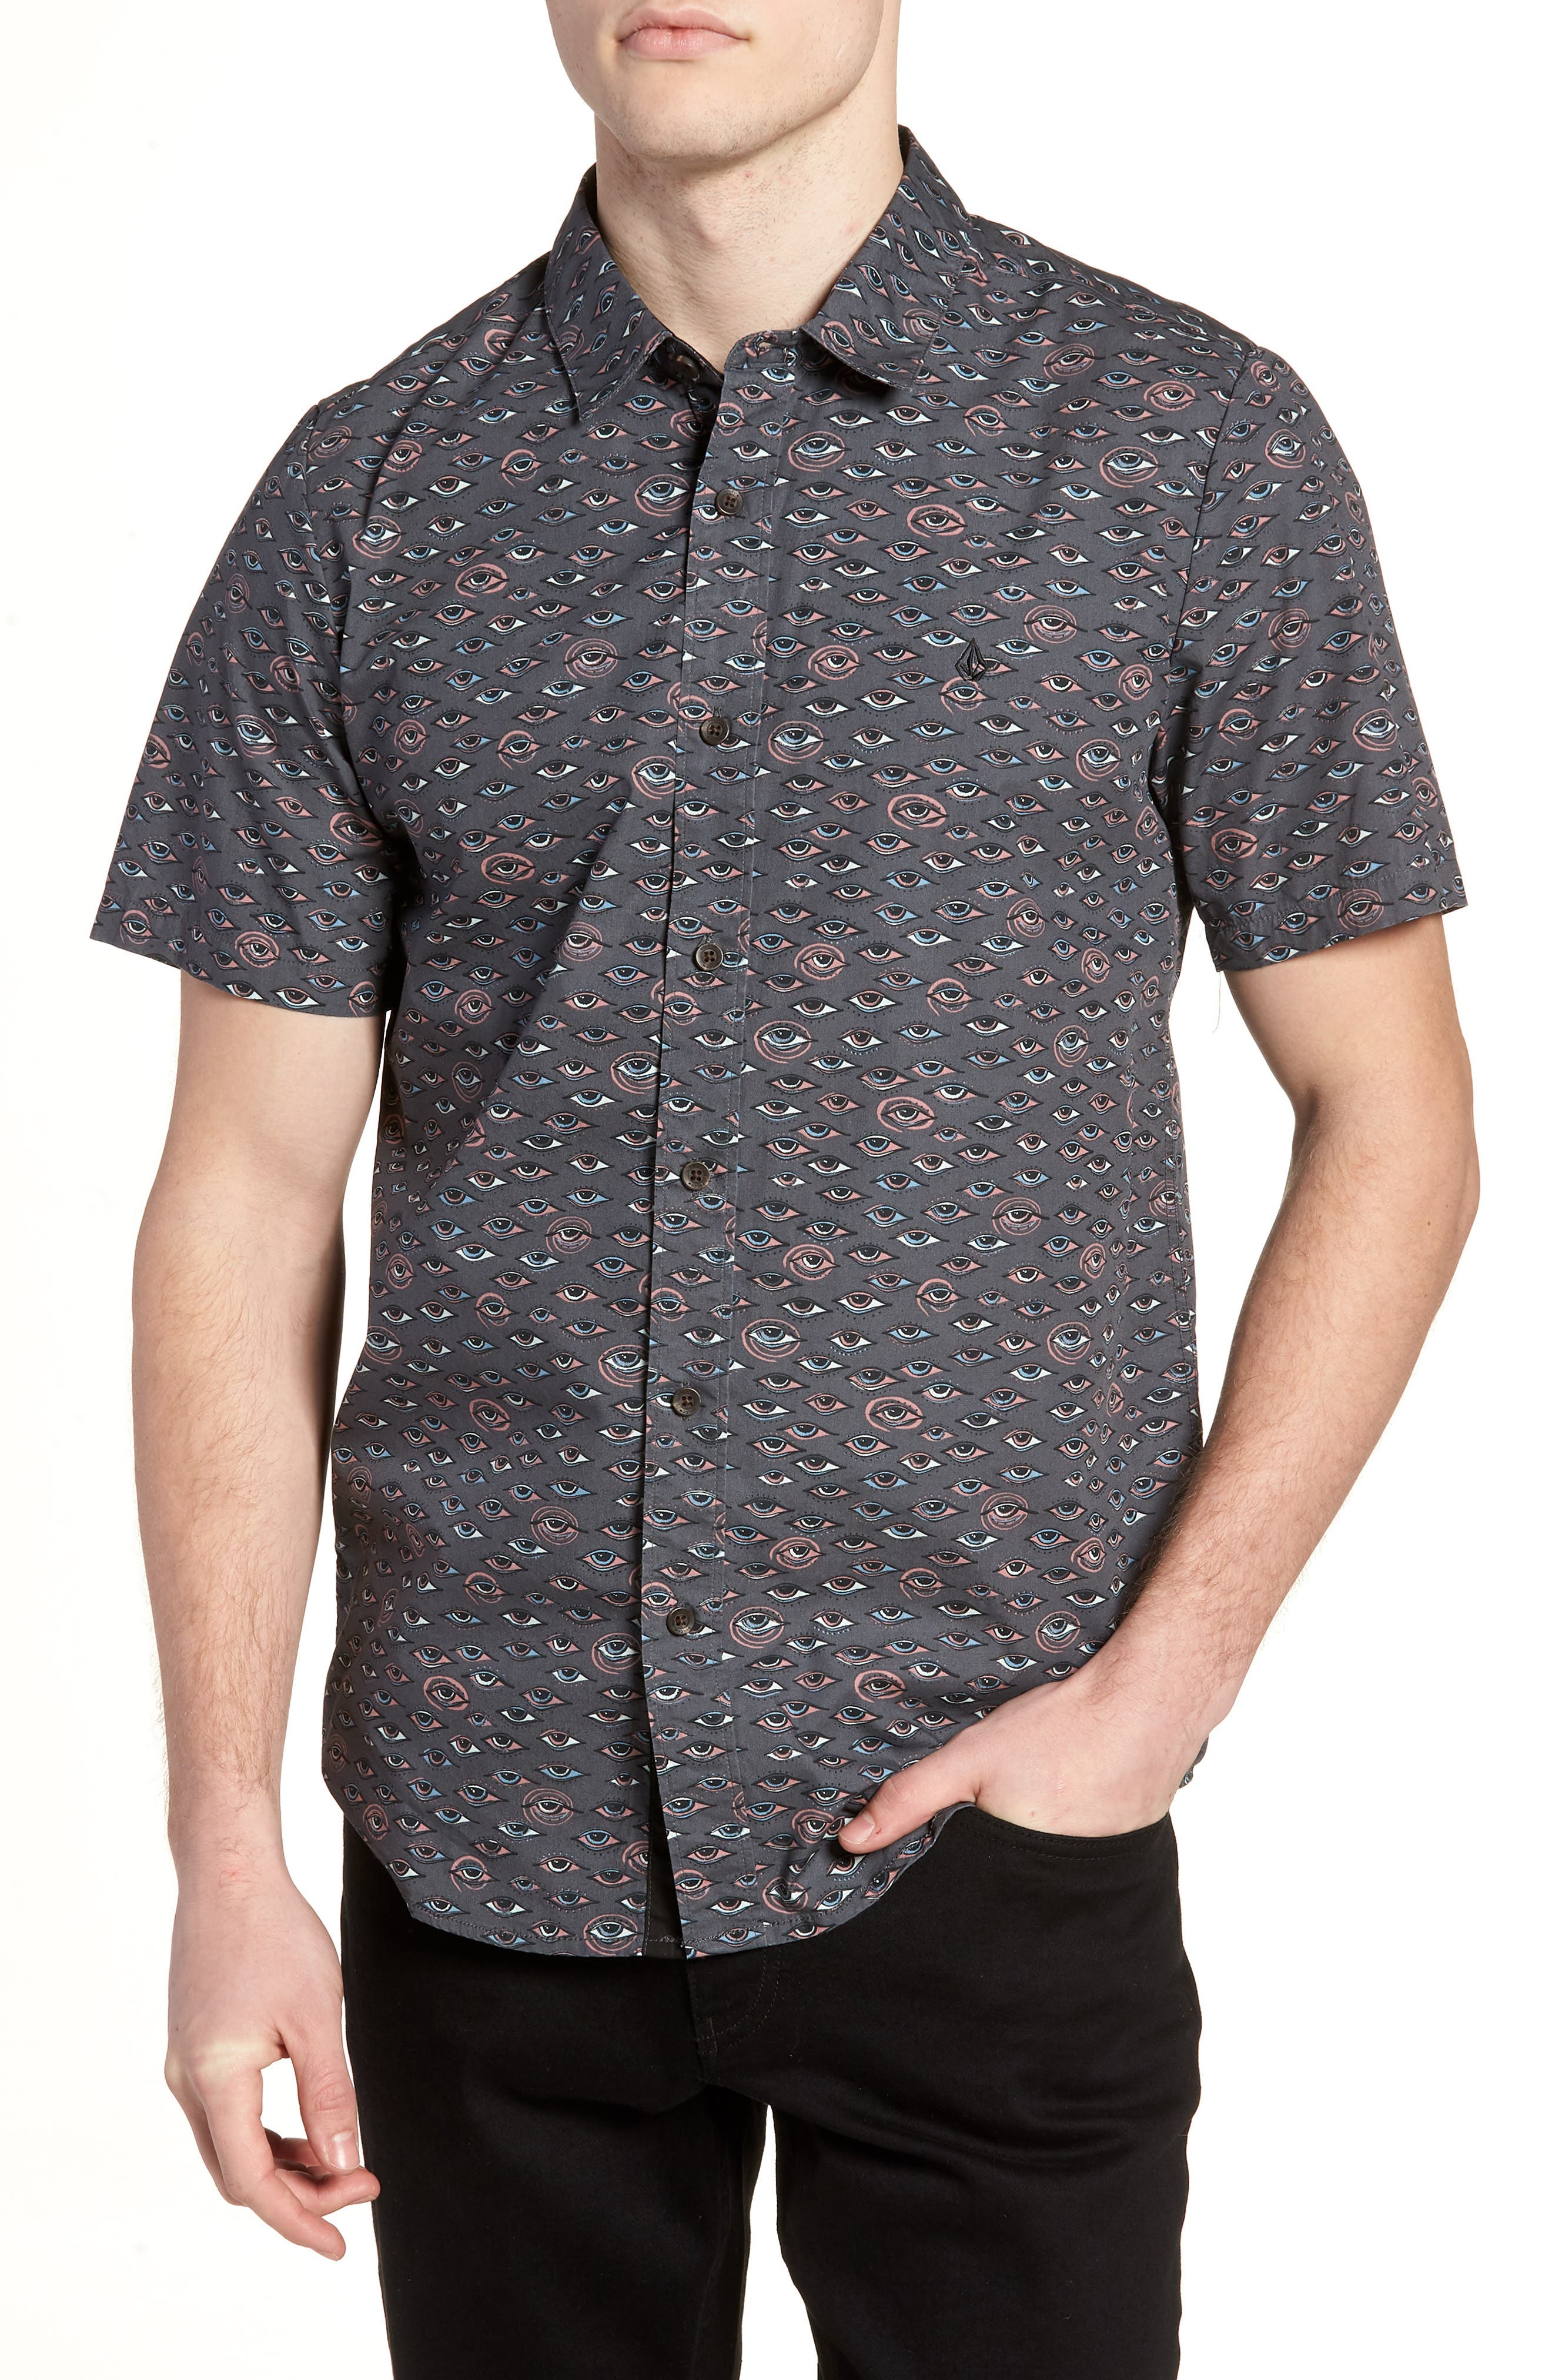 Alternate Image 1 Selected - Volcom Burch Woven Shirt